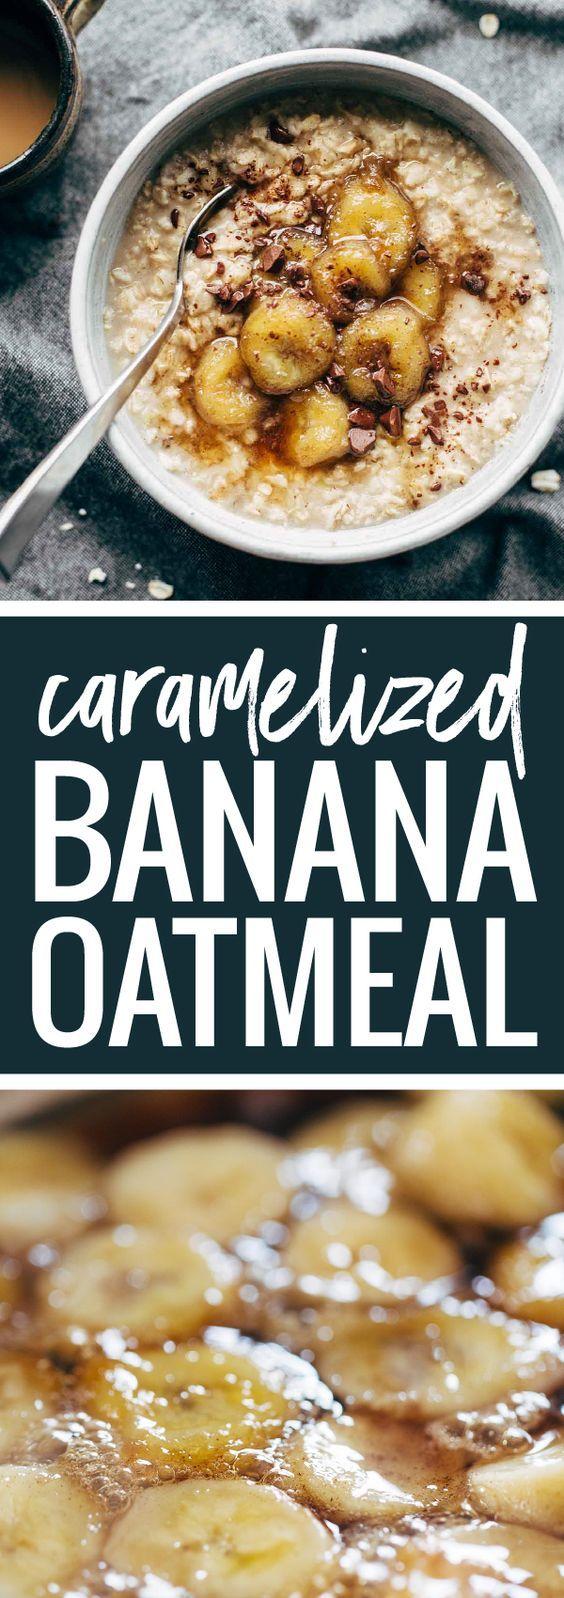 Caramelized Banana Oatmeal! Creamy oatmeal with bananas in a maple syrup/coconut oil glaze. No refined sugar! | pinchofyum.com